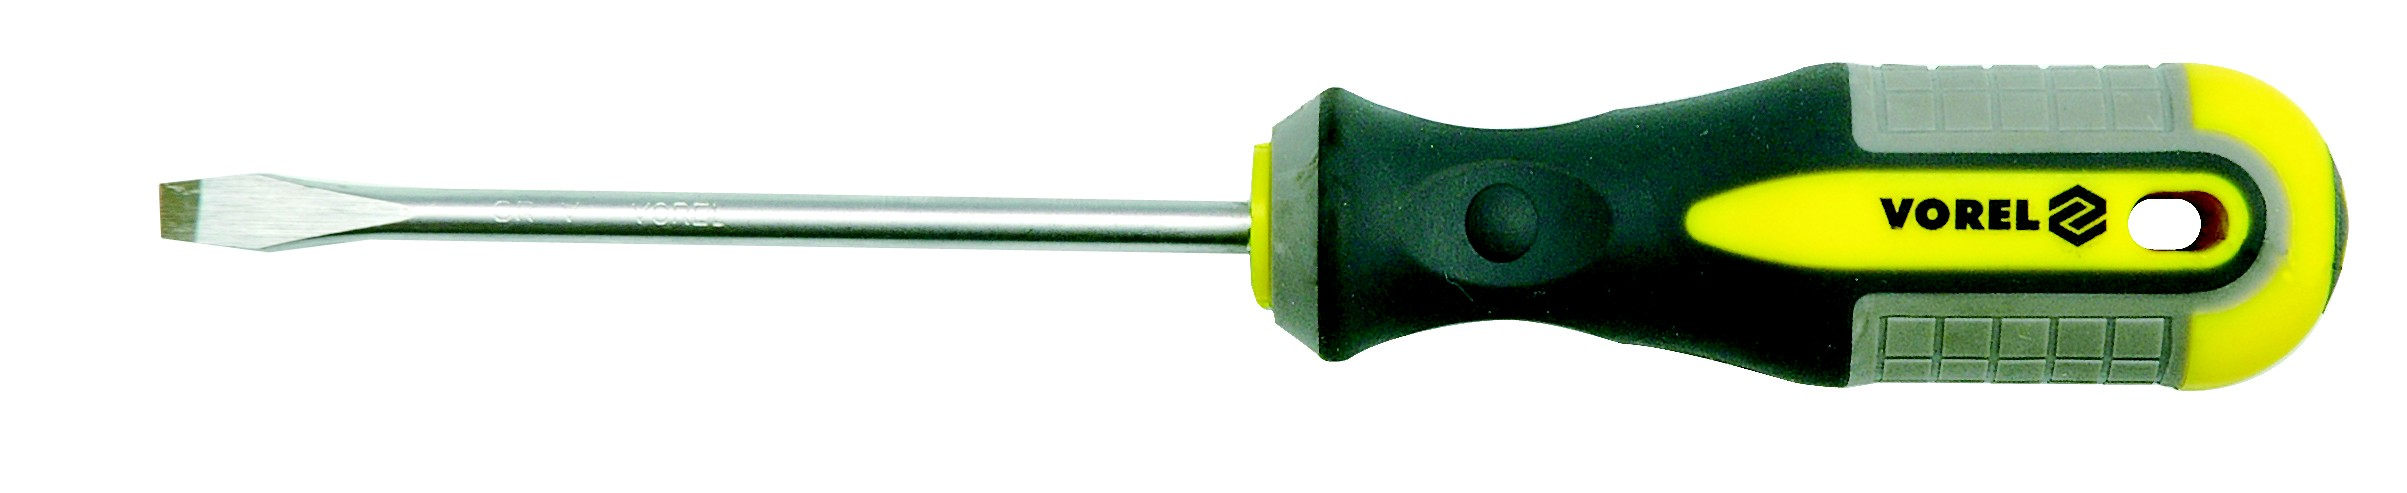 Šroubovák plochý 3 x 100 mm